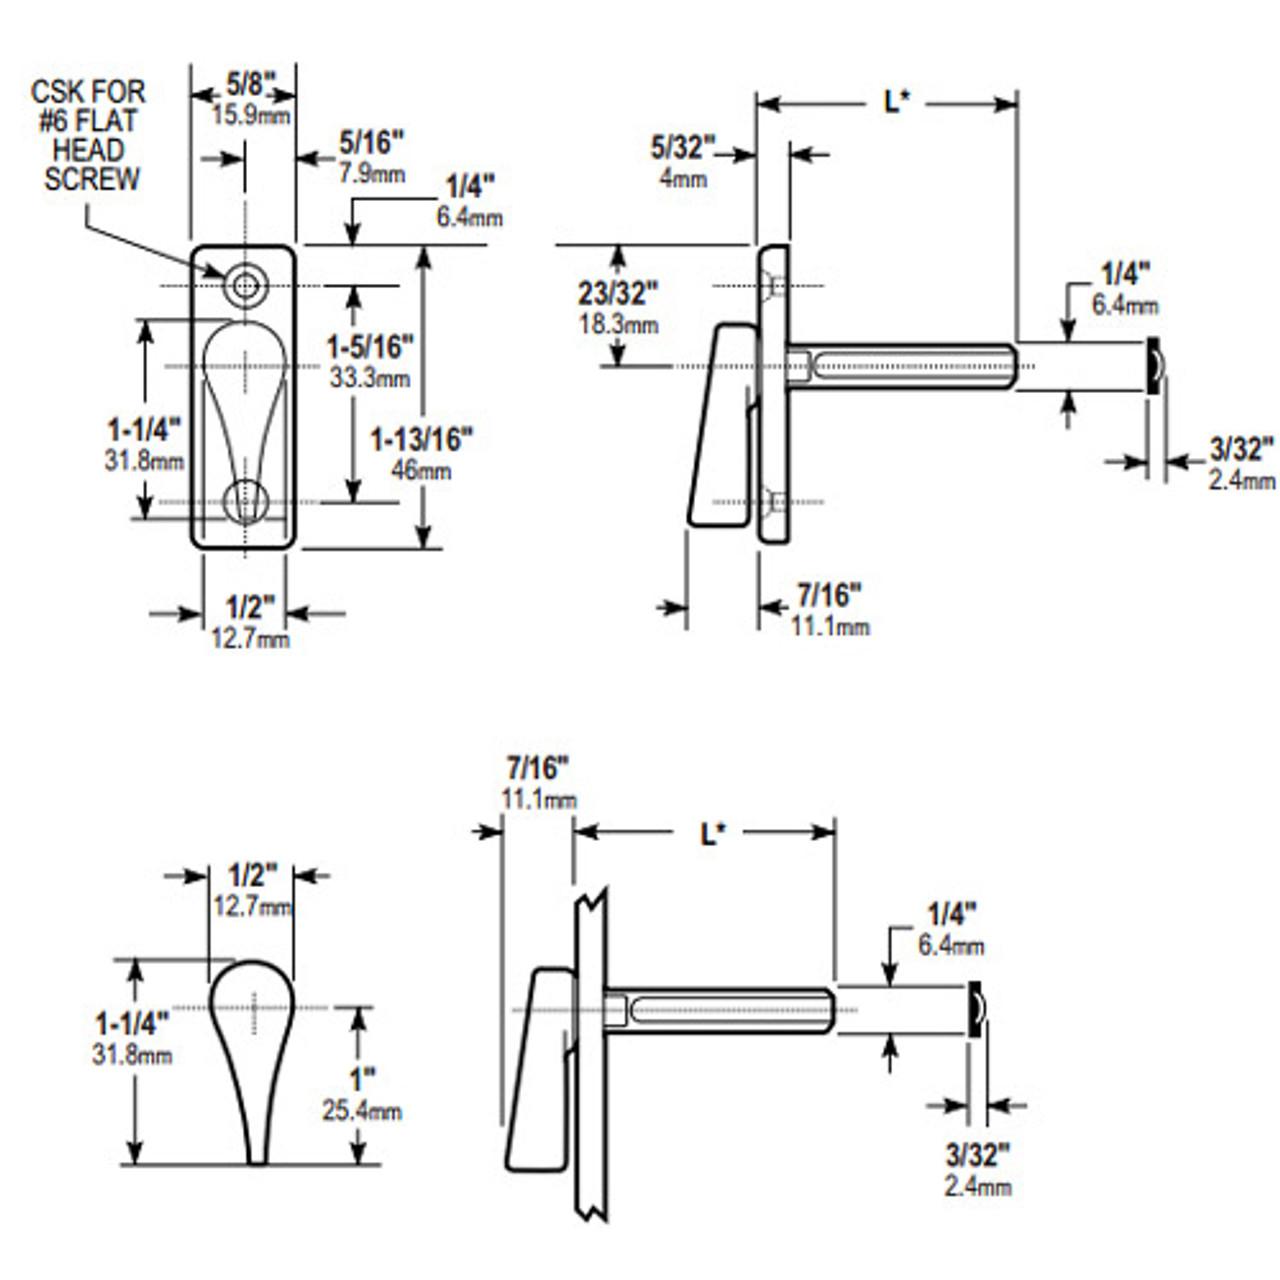 1000-21-19-121 Adams Rite 1000 Series Turns Dimensional View